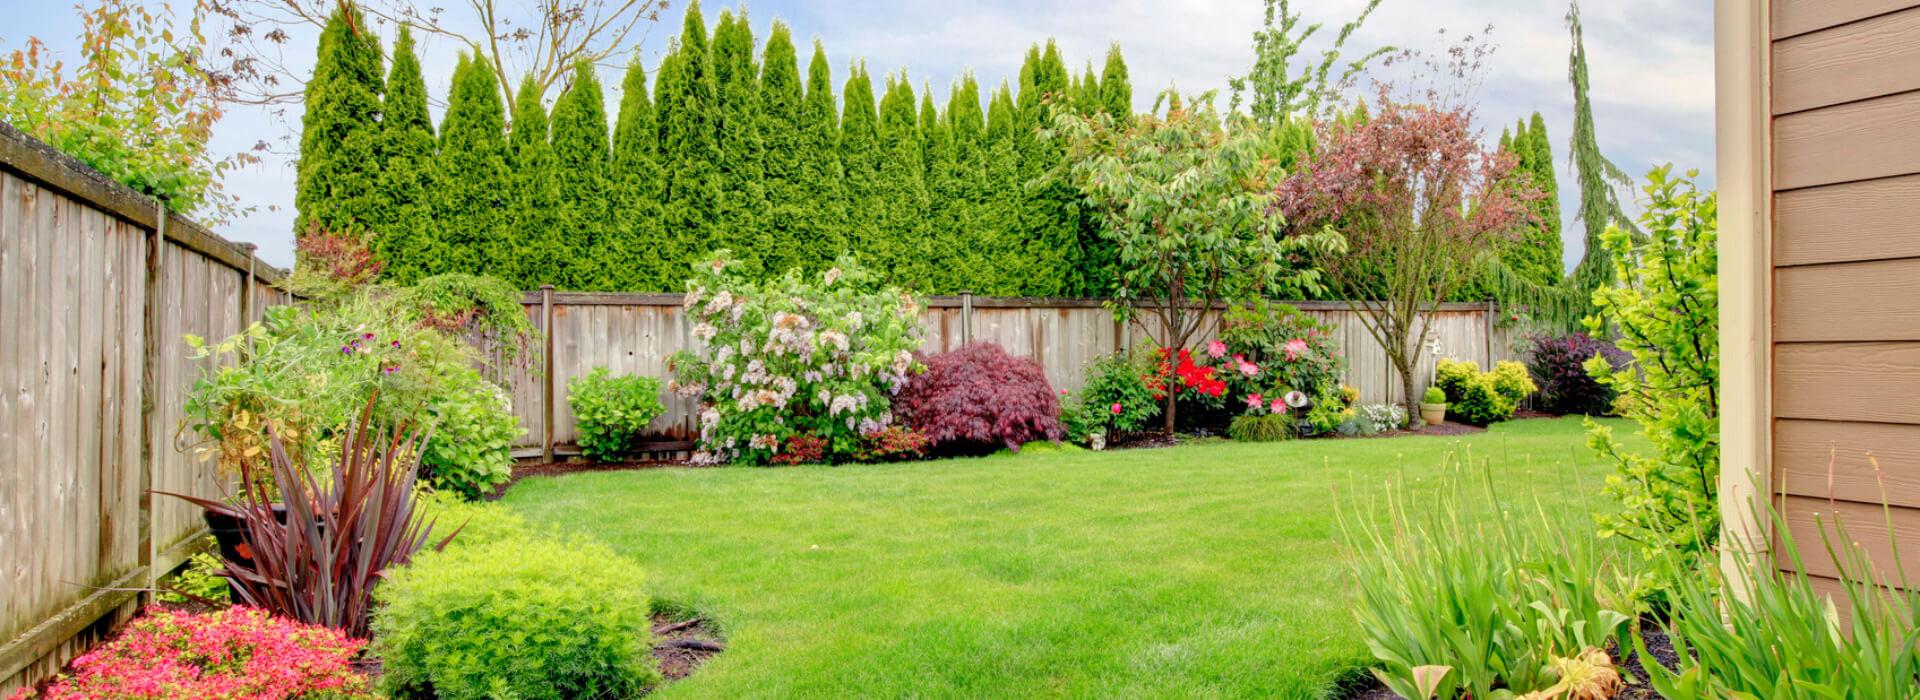 Residential Lawn Maintenance